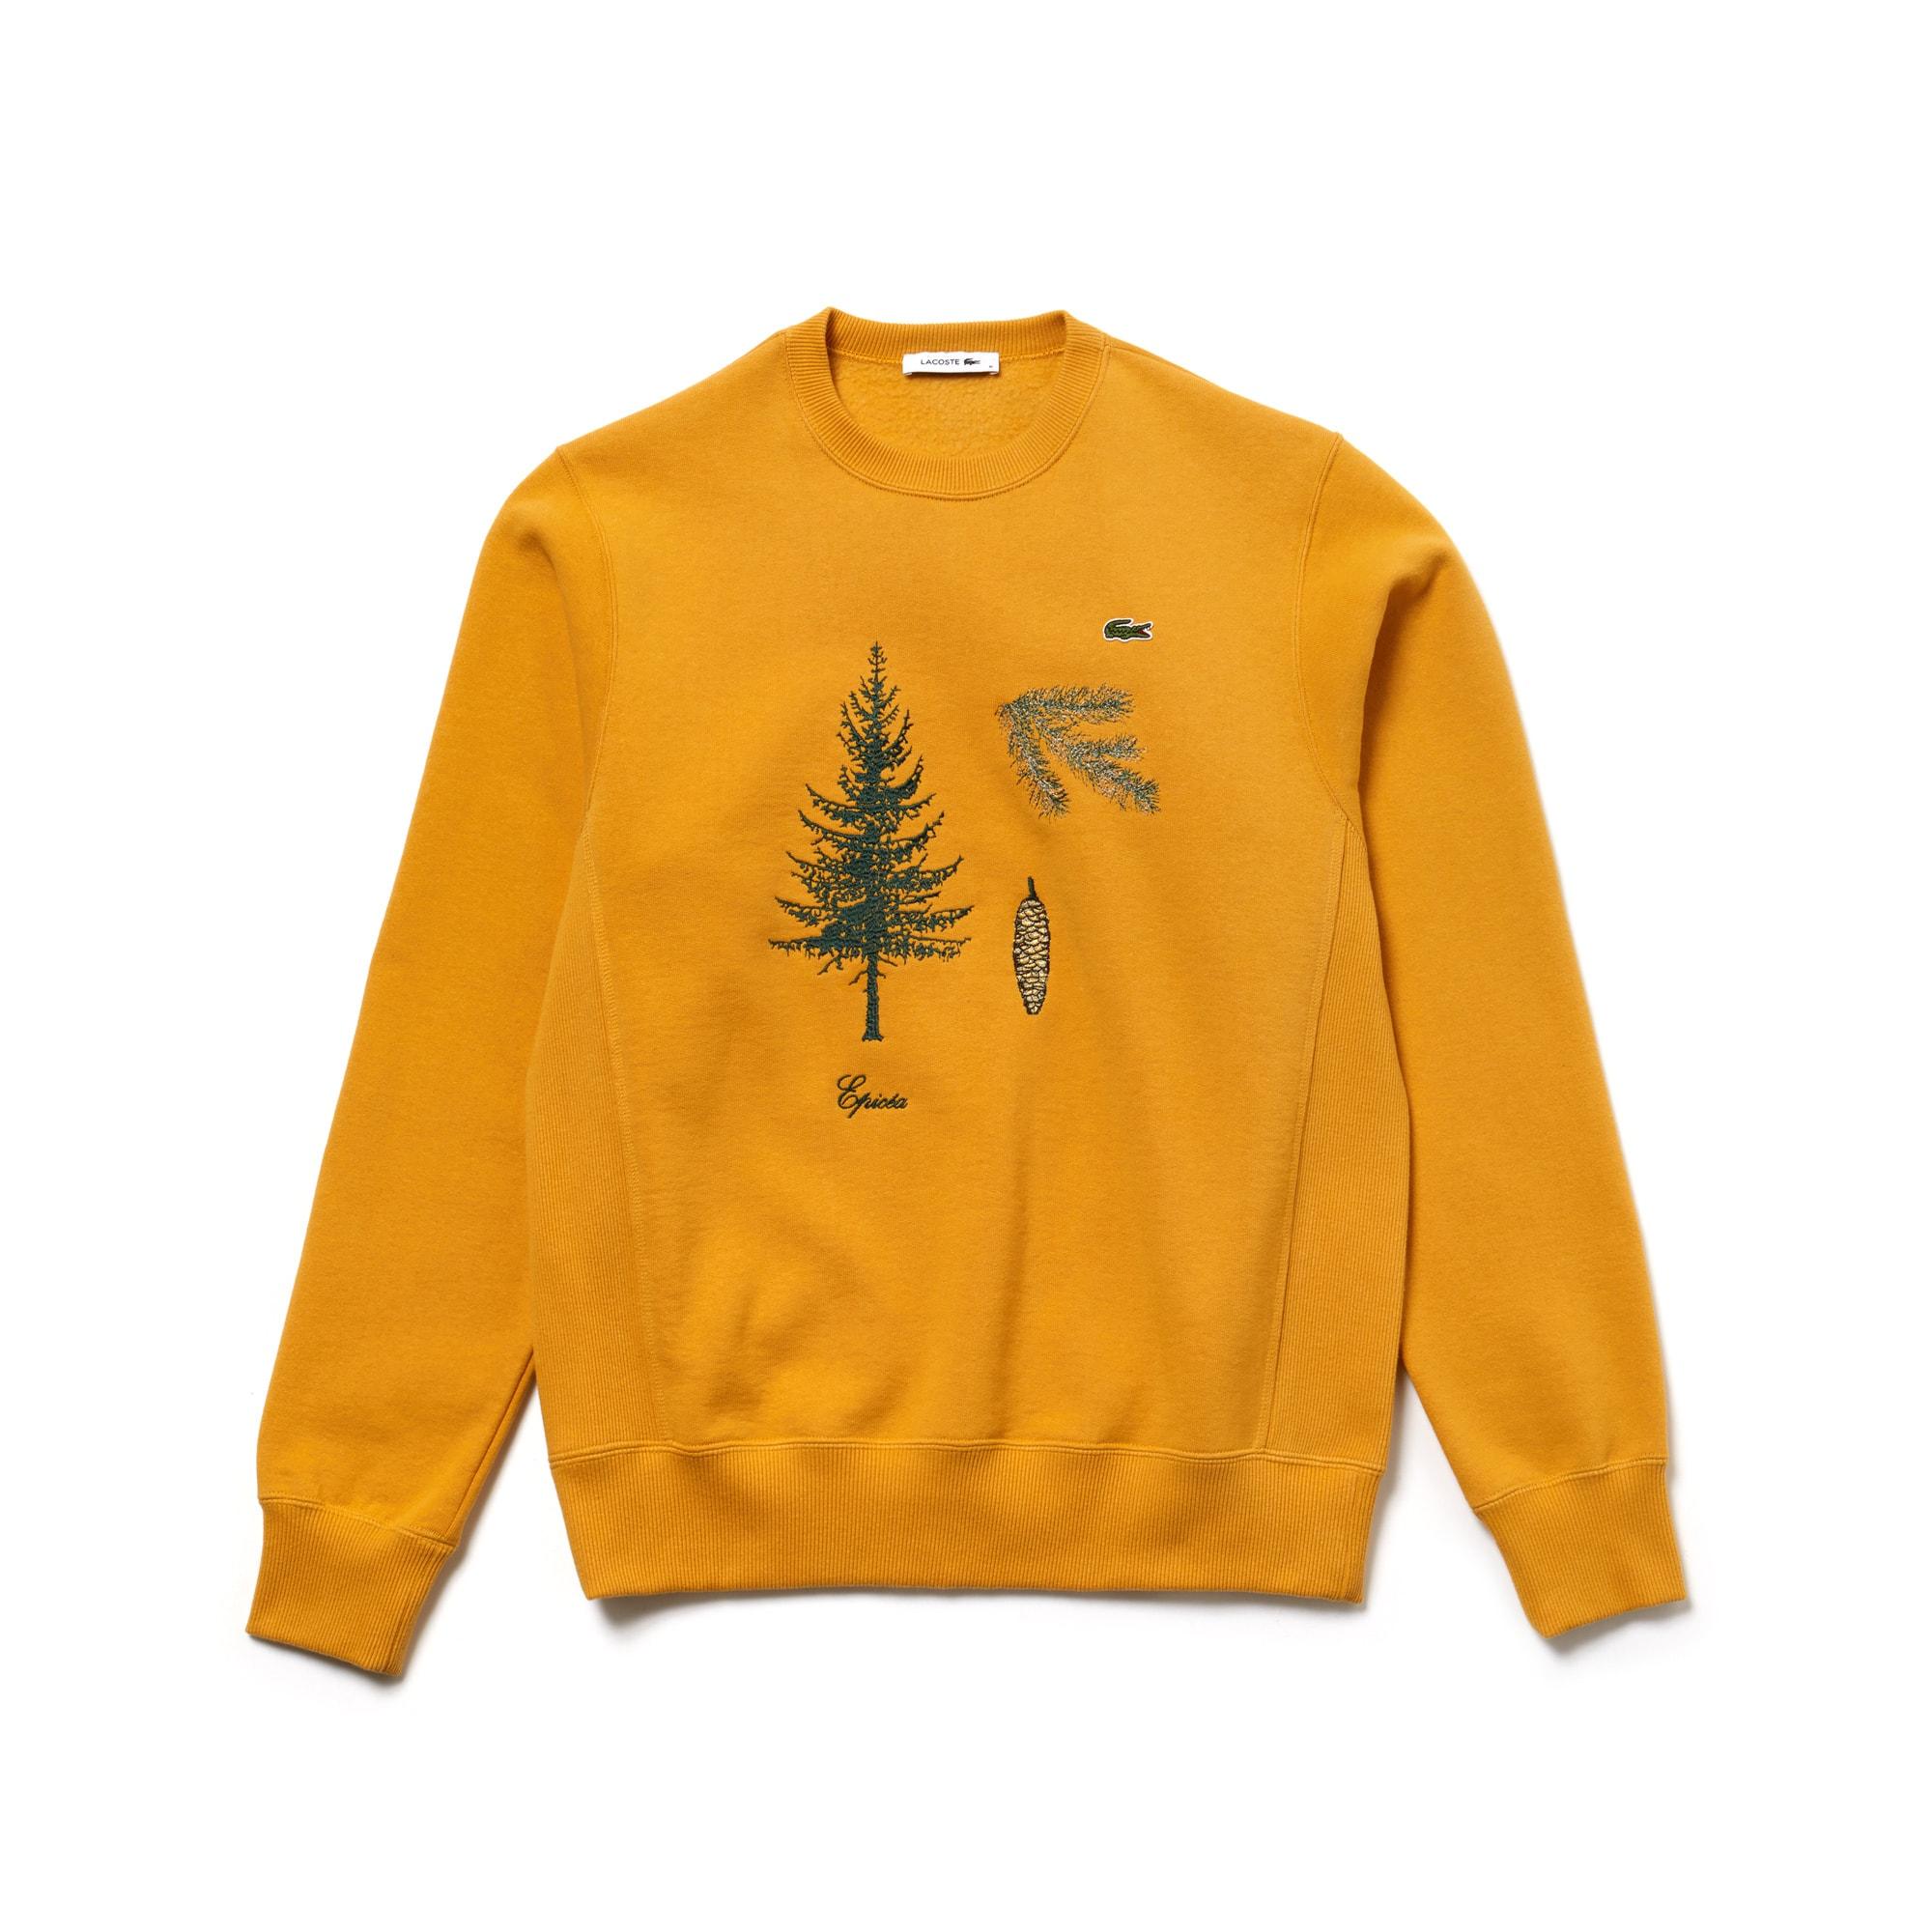 Fashion Show-sweatshirt Unisex Geborduurde Fleece